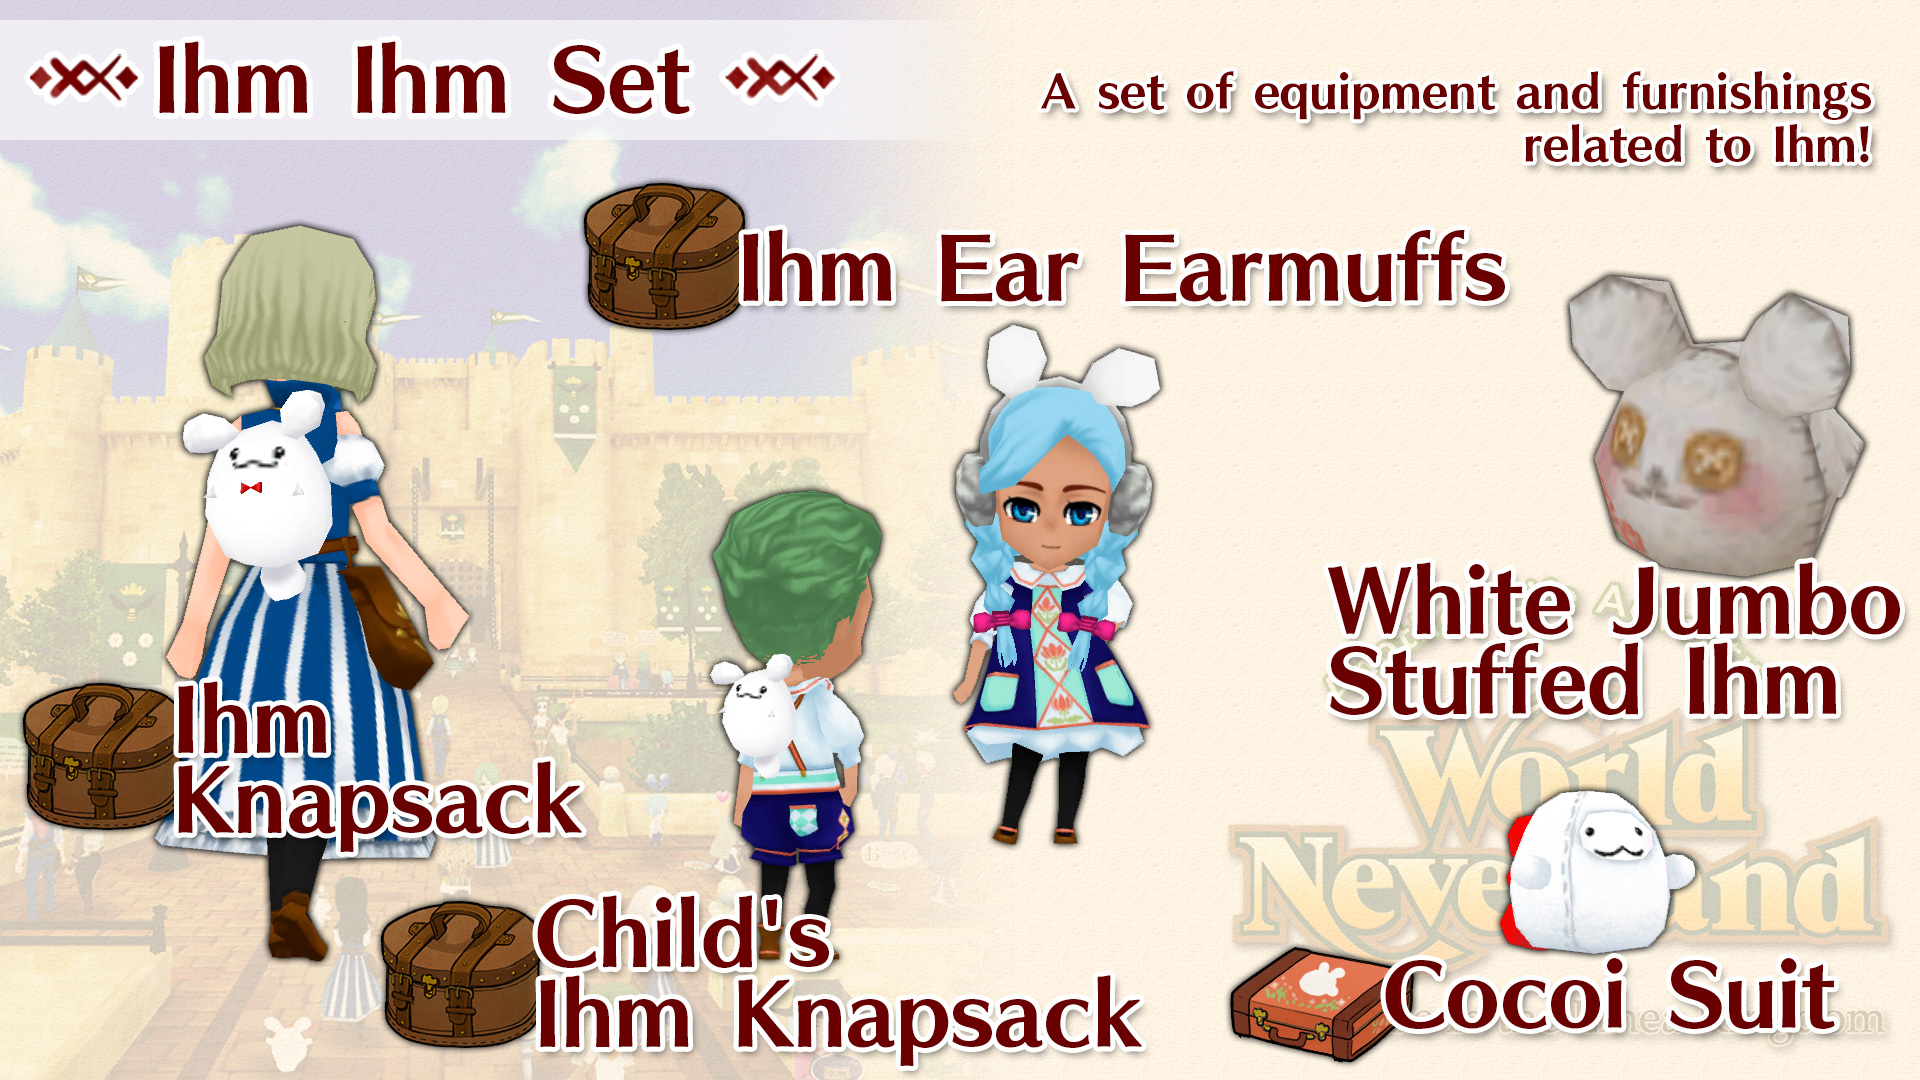 Ihm Ihm Set (Child's Ihm Knapsack, Ihm Knapsack, Ihm Ear Earmuffs, White Jumbo Stuffed Ihm, Cocoi Suit)